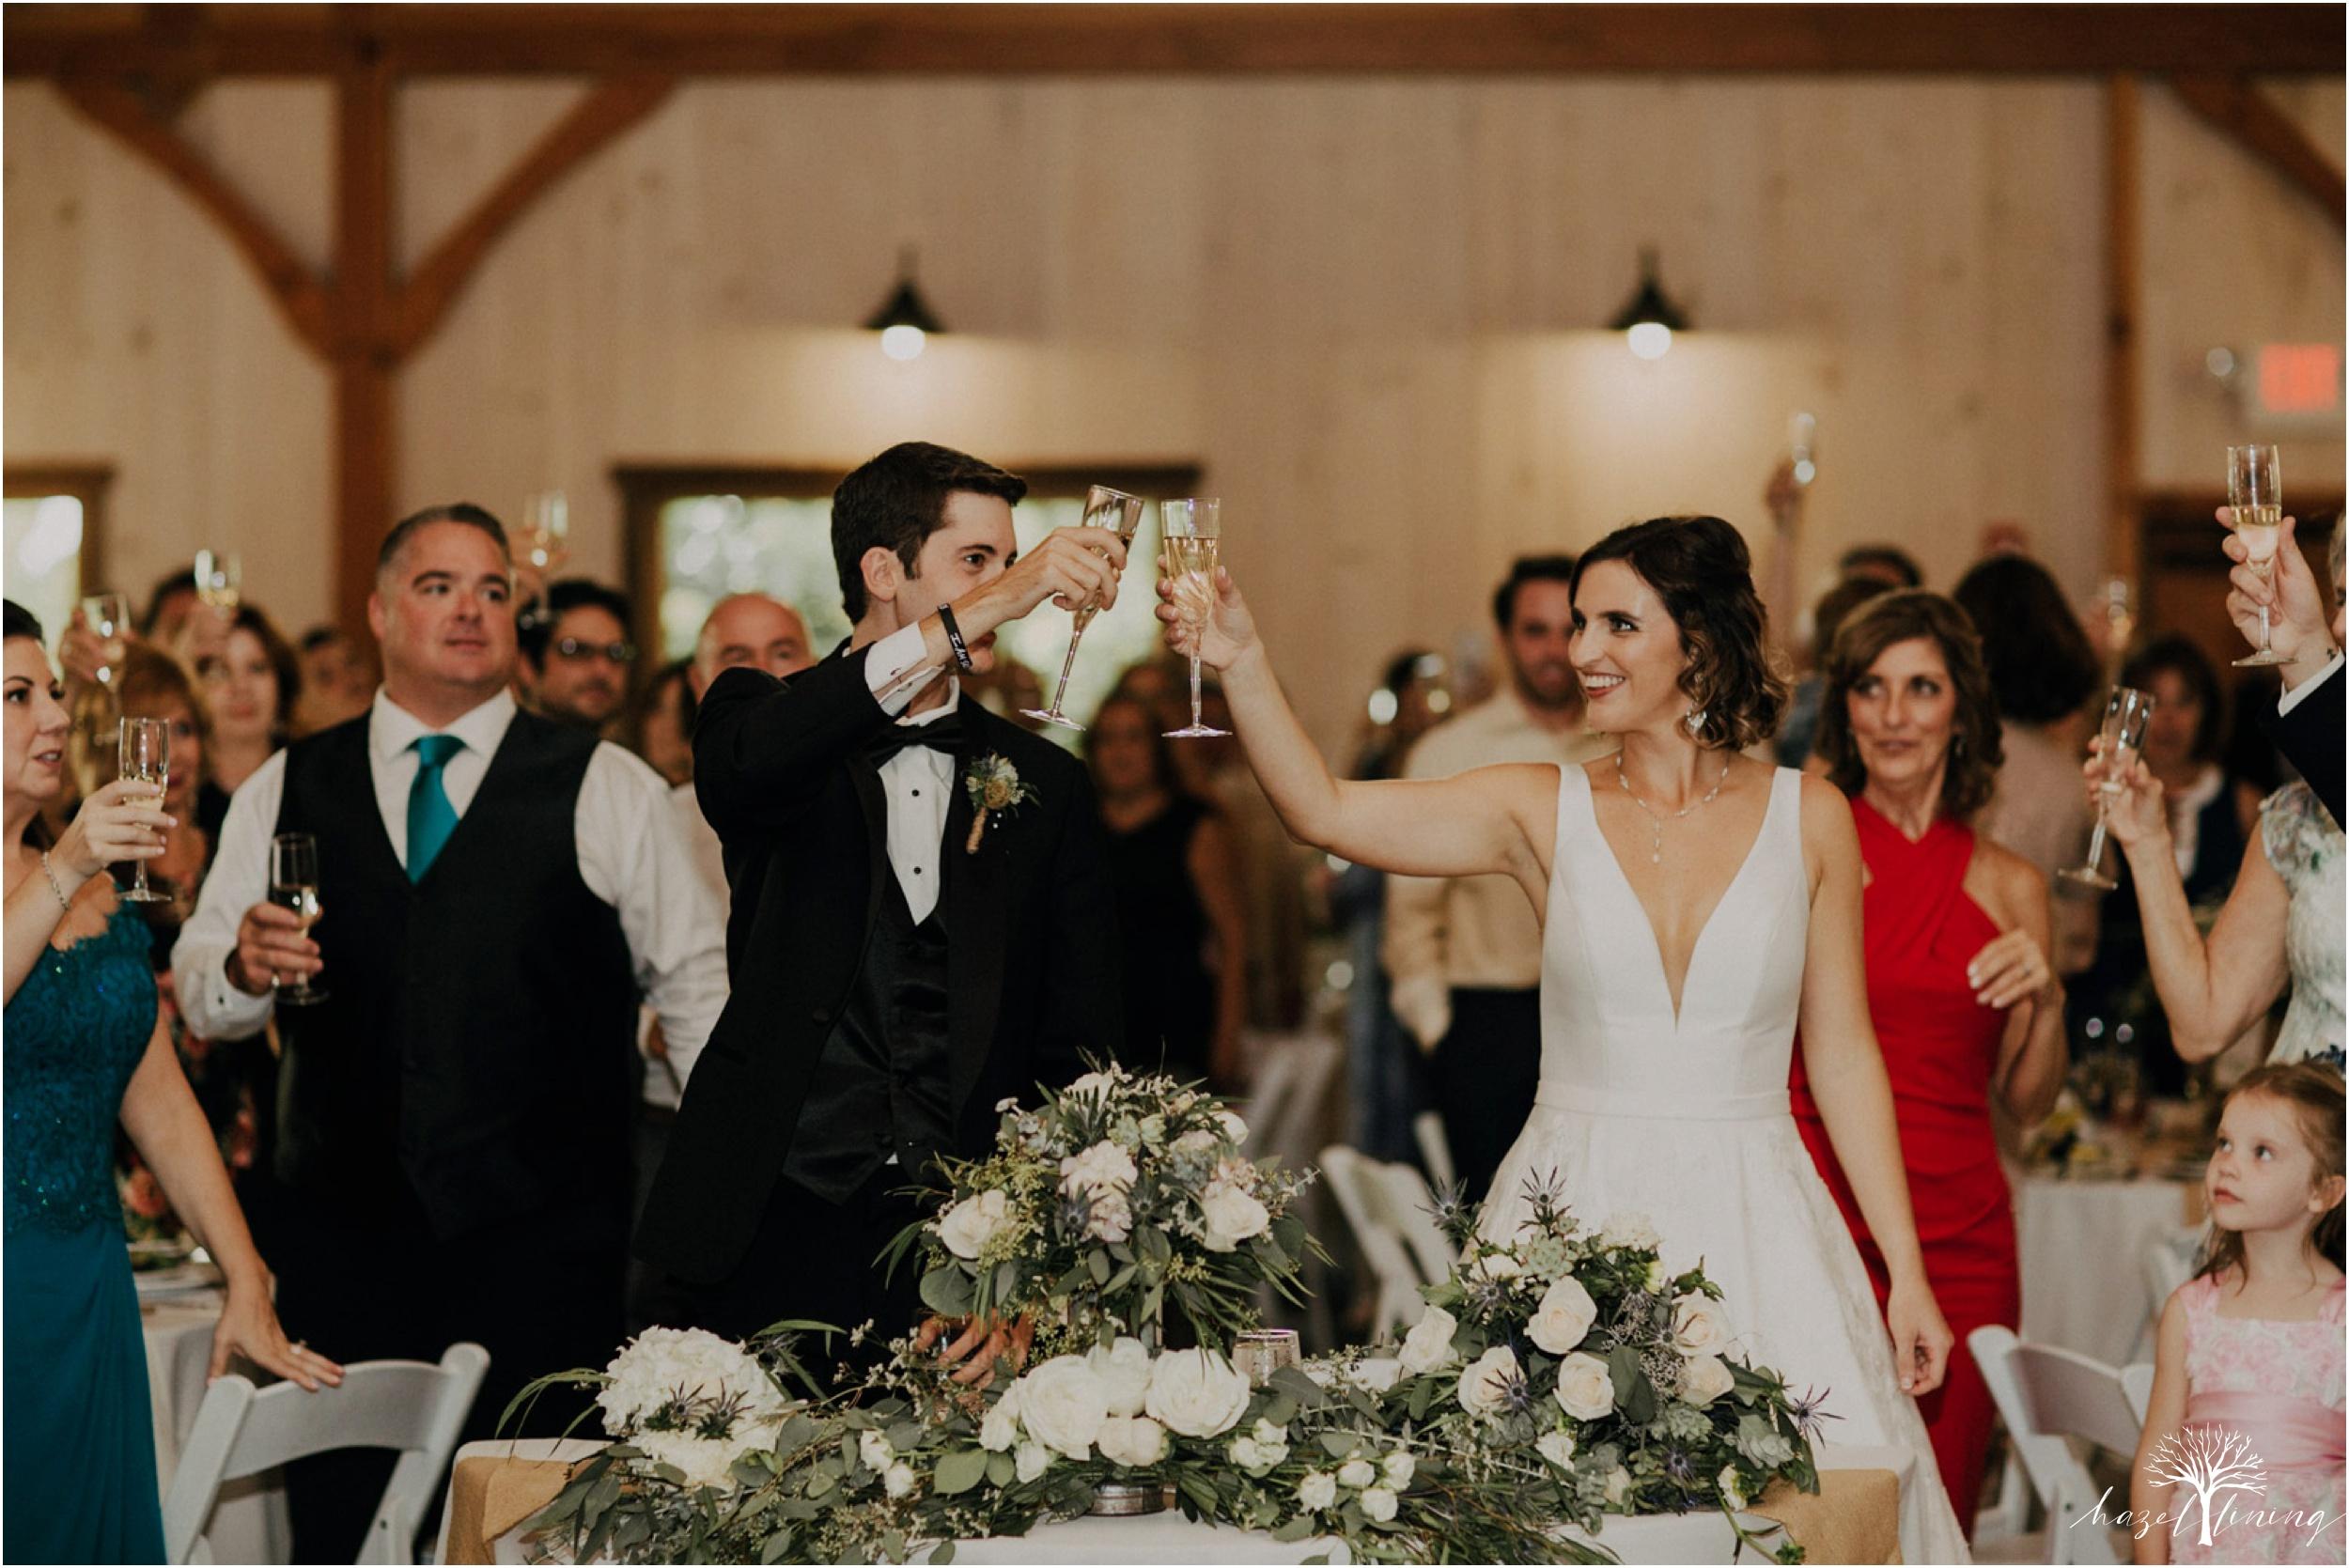 maureen-hepner-anthony-giordano-rose-bank-winery-newtow-pennsylvania-luxury-summer-wedding-hazel-lining-photography-destination-elopement-wedding-engagement-photography_0139.jpg